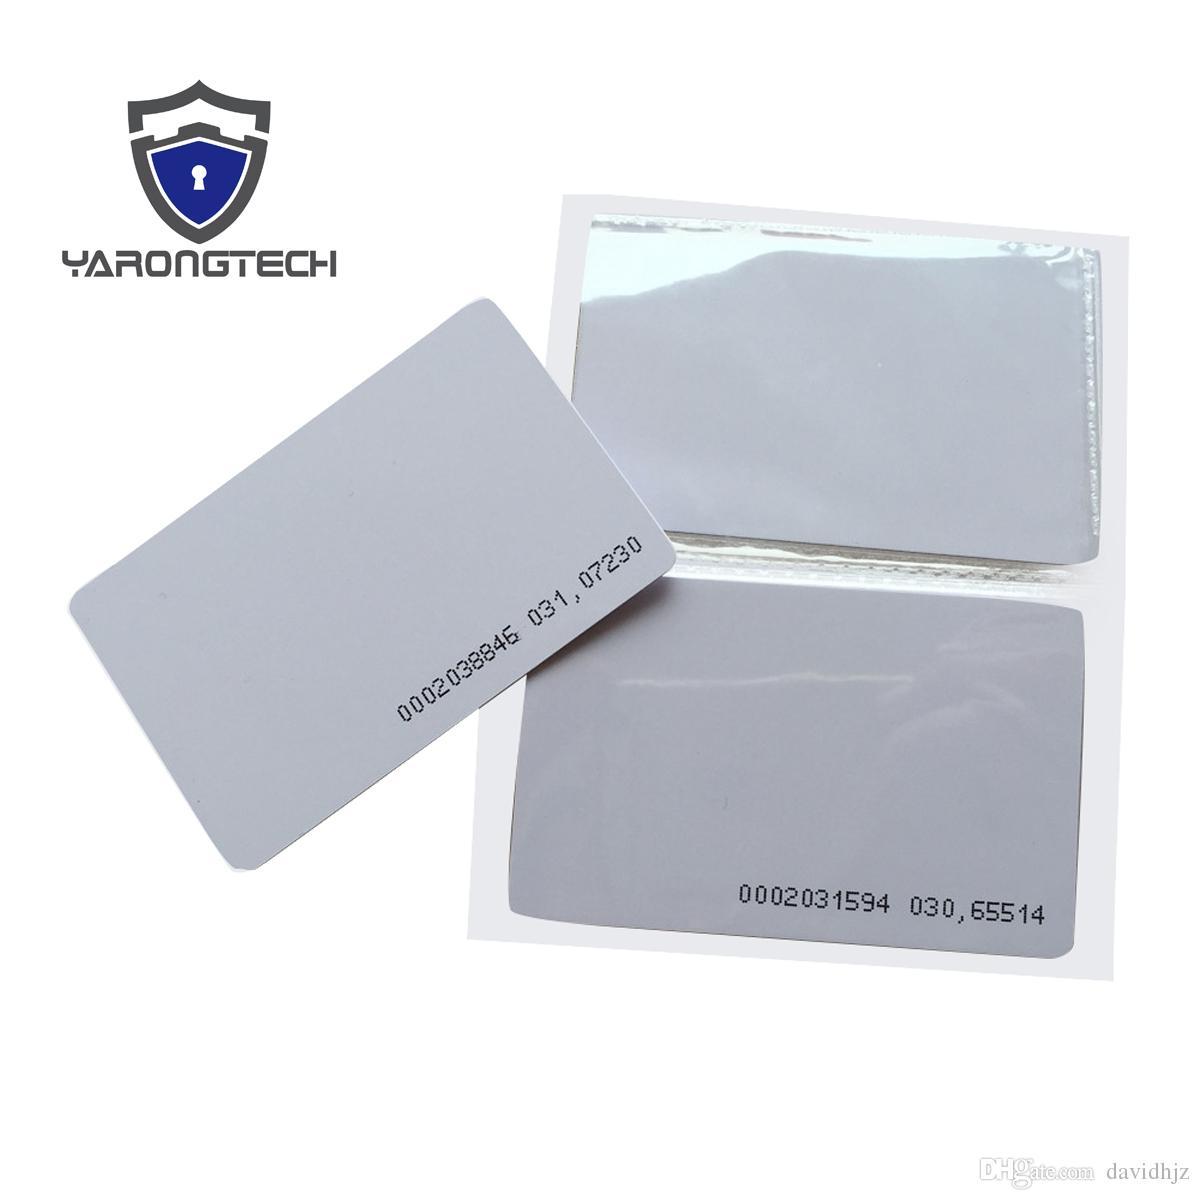 TK4100 4102 / EM 4100 tarjeta RFID en blanco con UID impresa